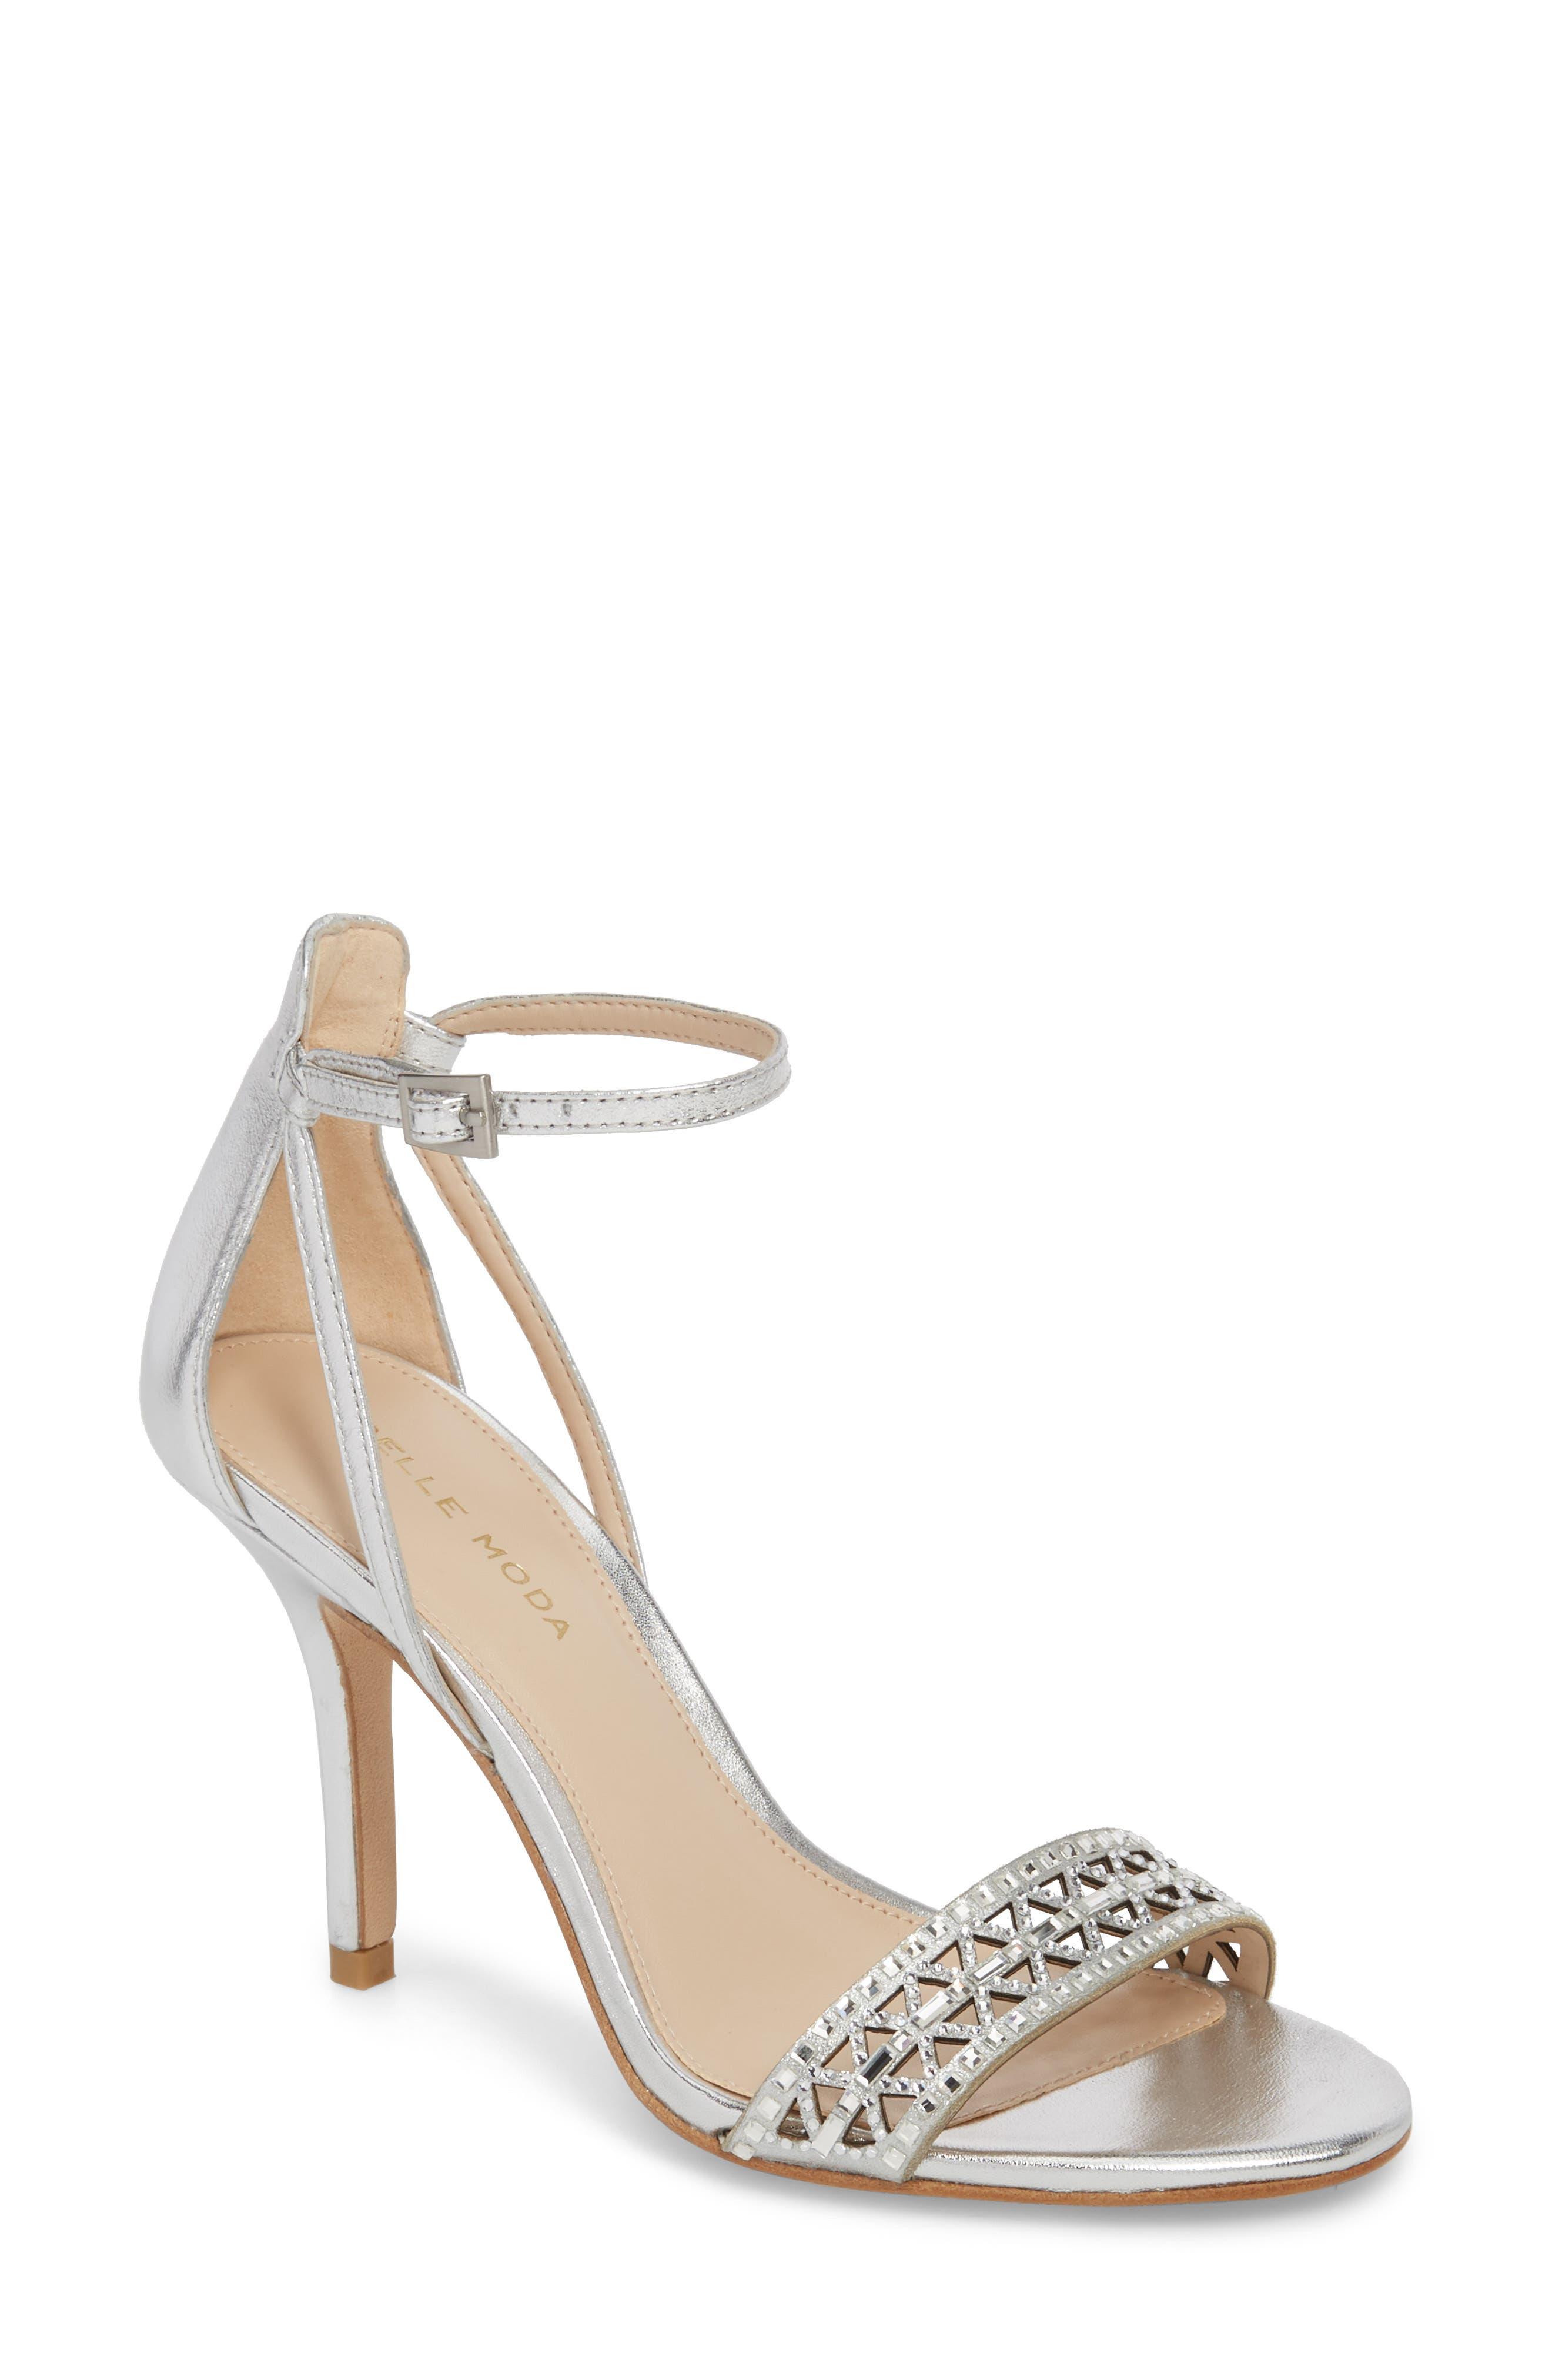 Karmina Embellished Sandal,                             Main thumbnail 1, color,                             Silver Leather